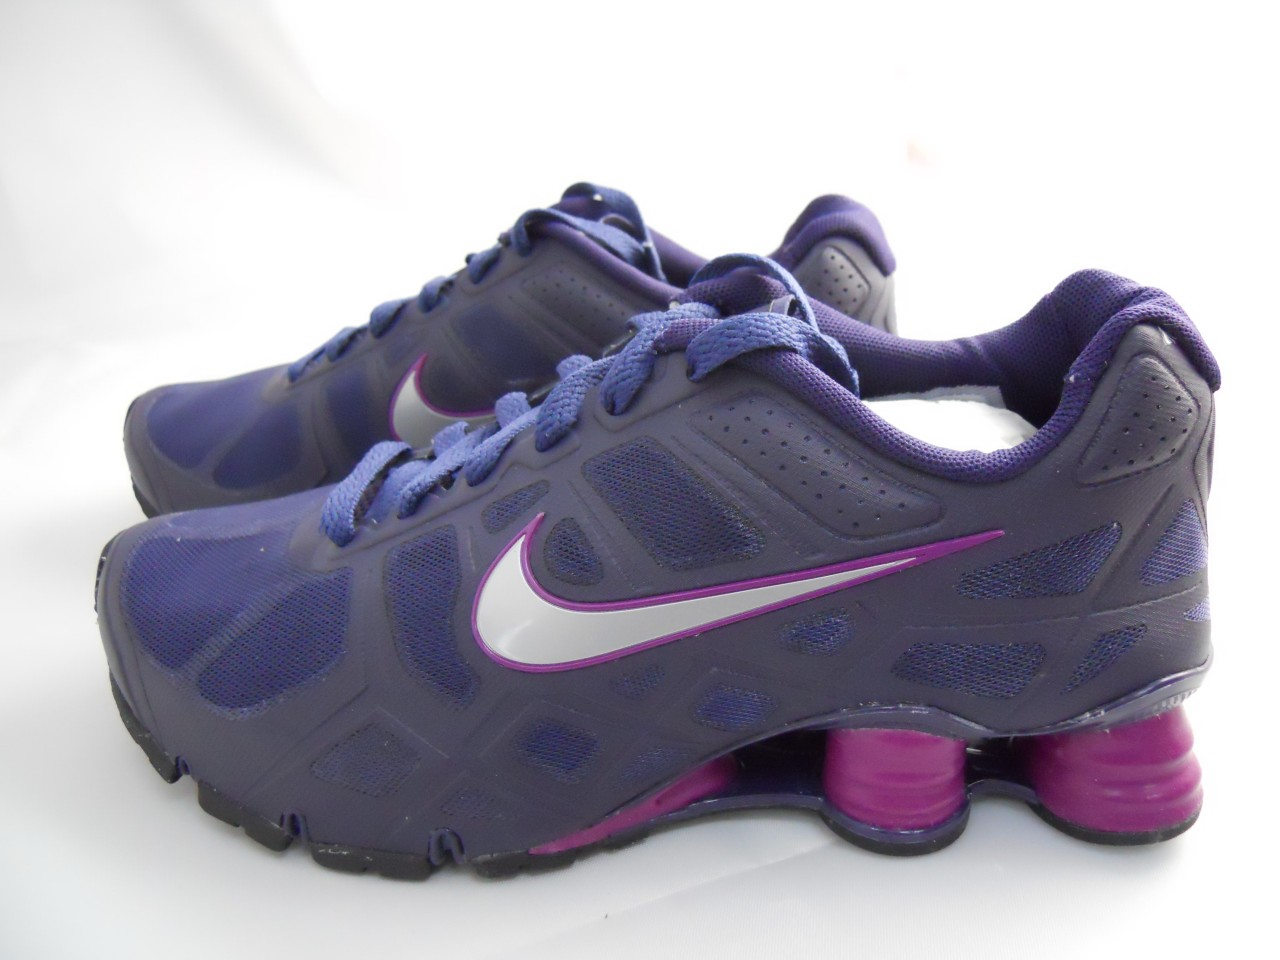 Nike Shox Turbo 2014 New Juniors Nike Shox Turbo 12